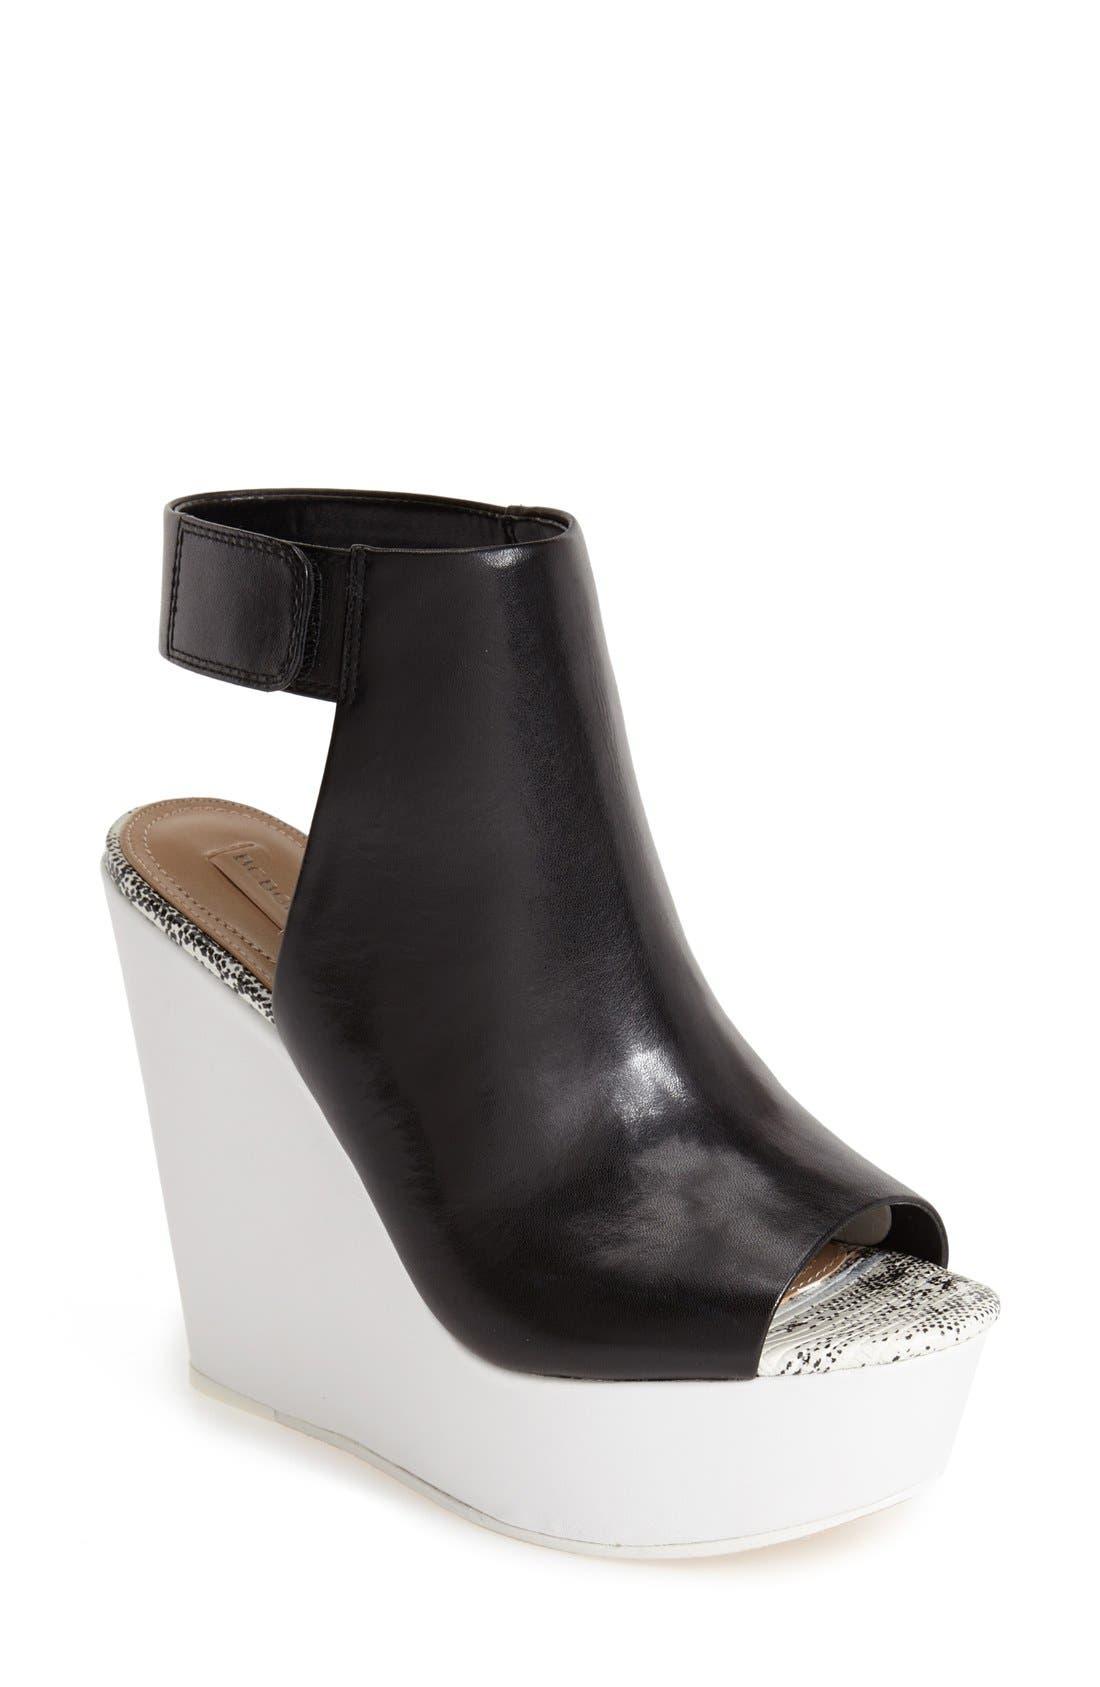 Alternate Image 1 Selected - BCBGMAXAZRIA 'Ma-Cue' Peep Toe Leather Wedge Sandal (Women)